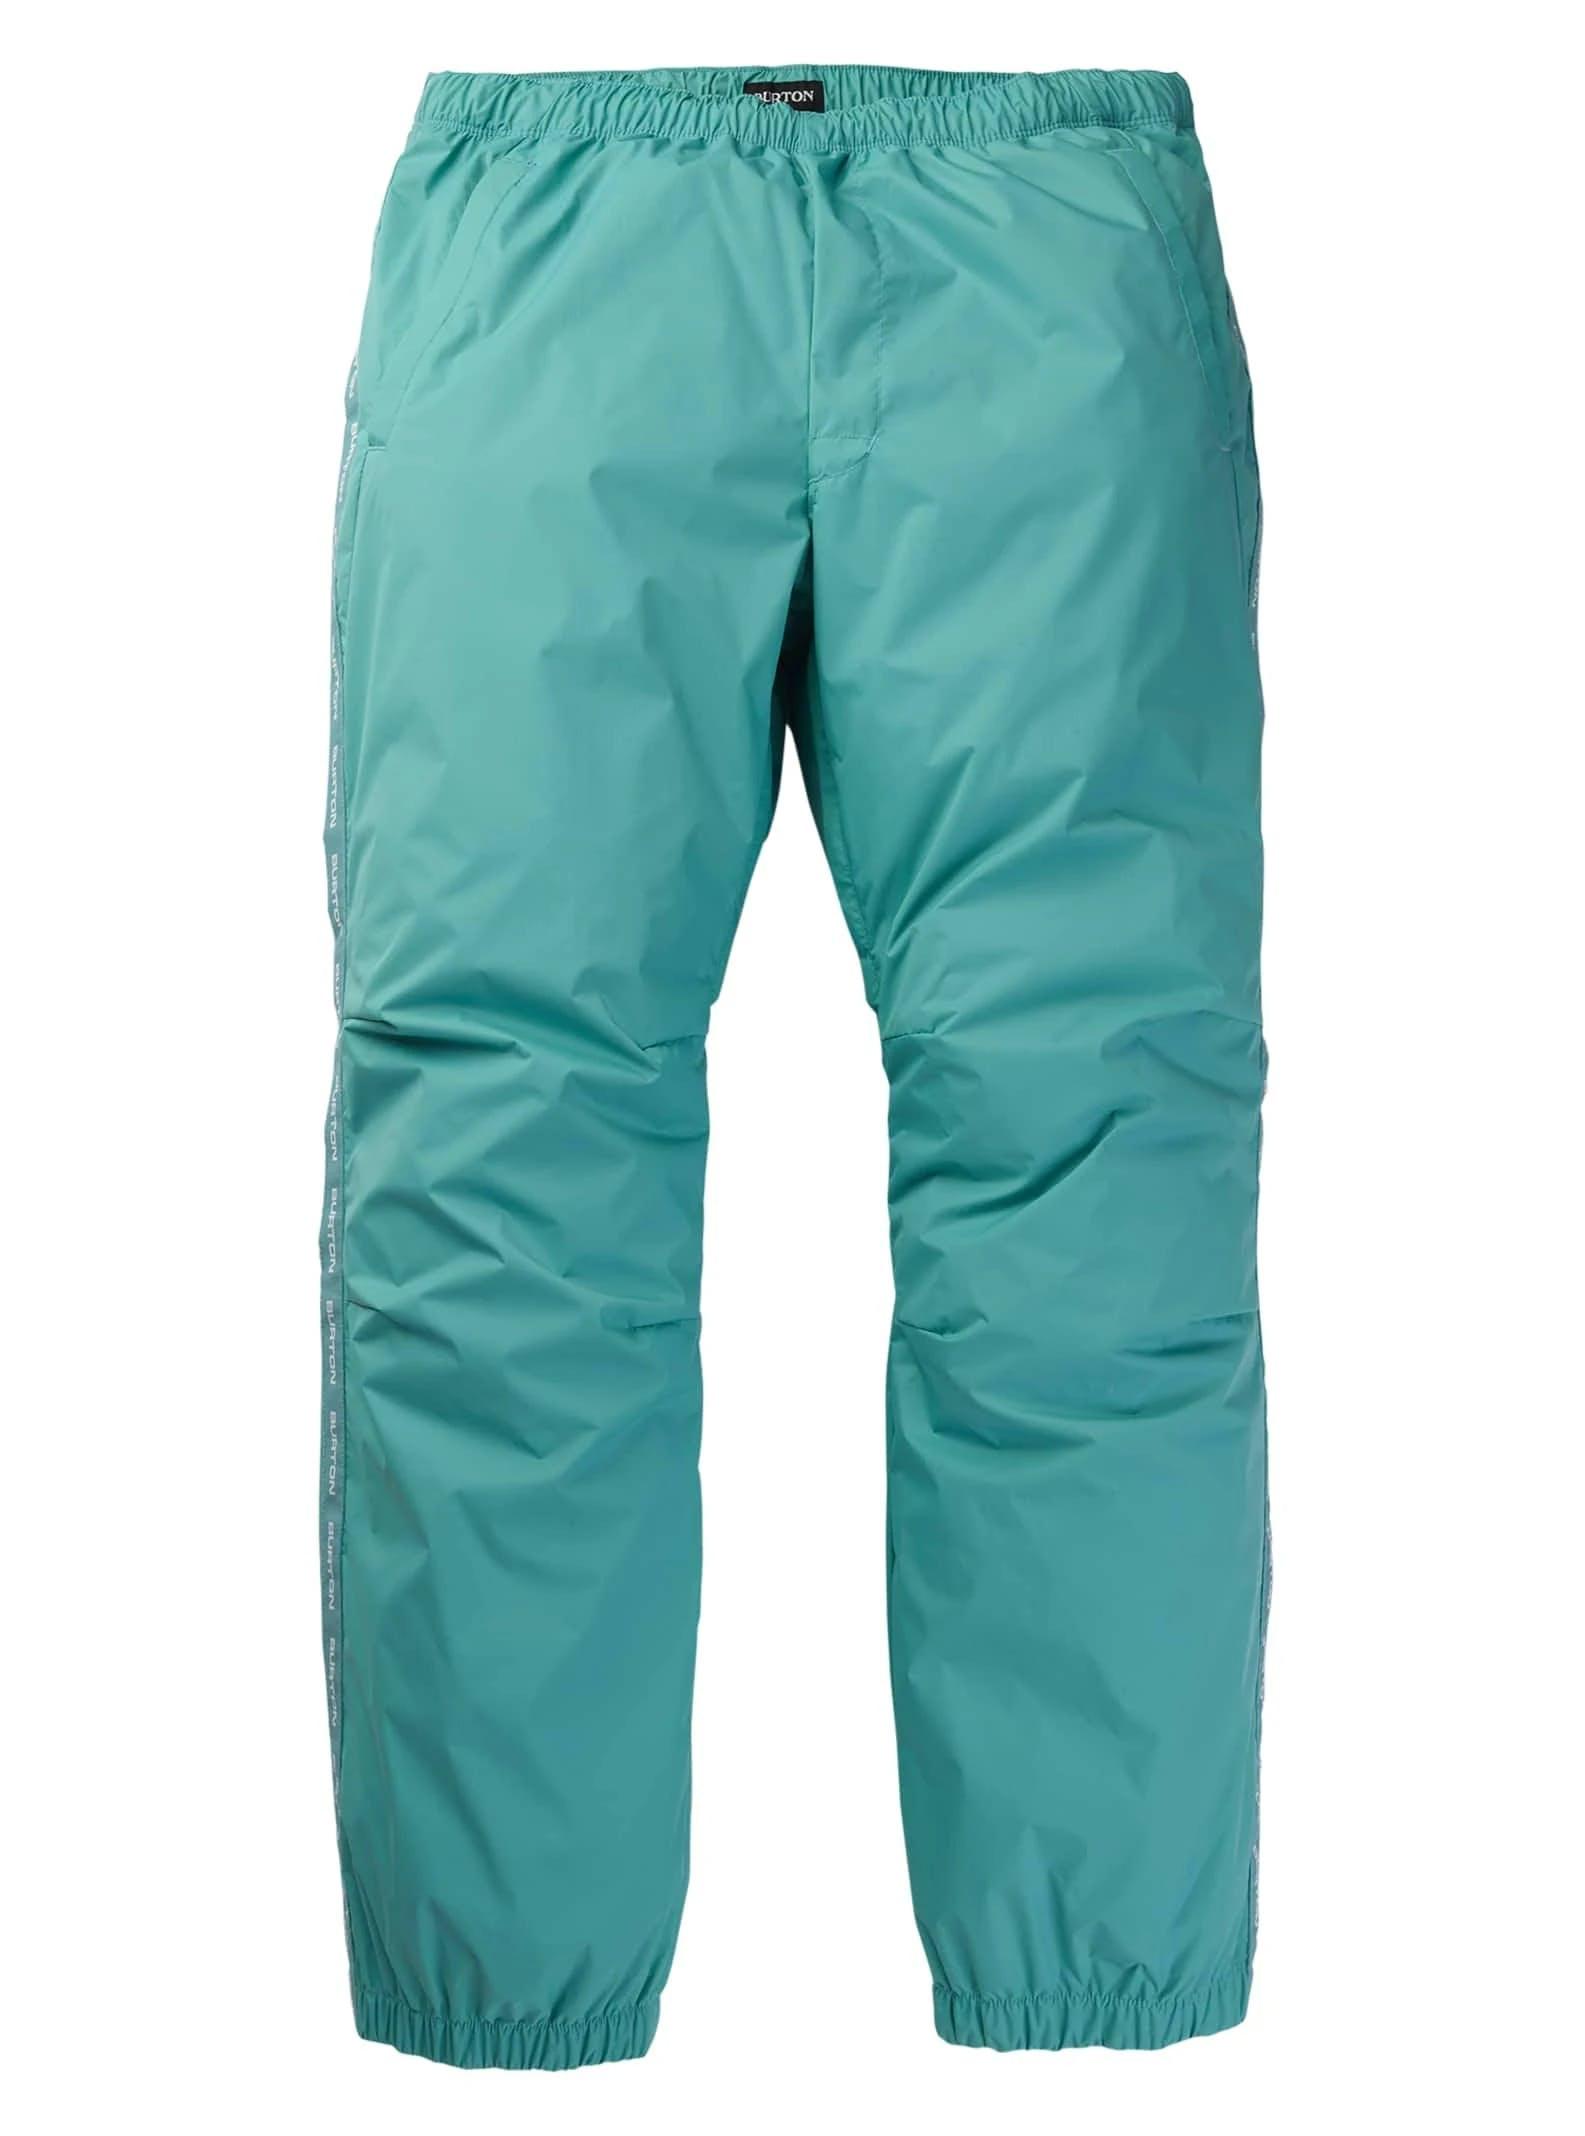 Burton Men's Melter Pant Buoy Blue Large